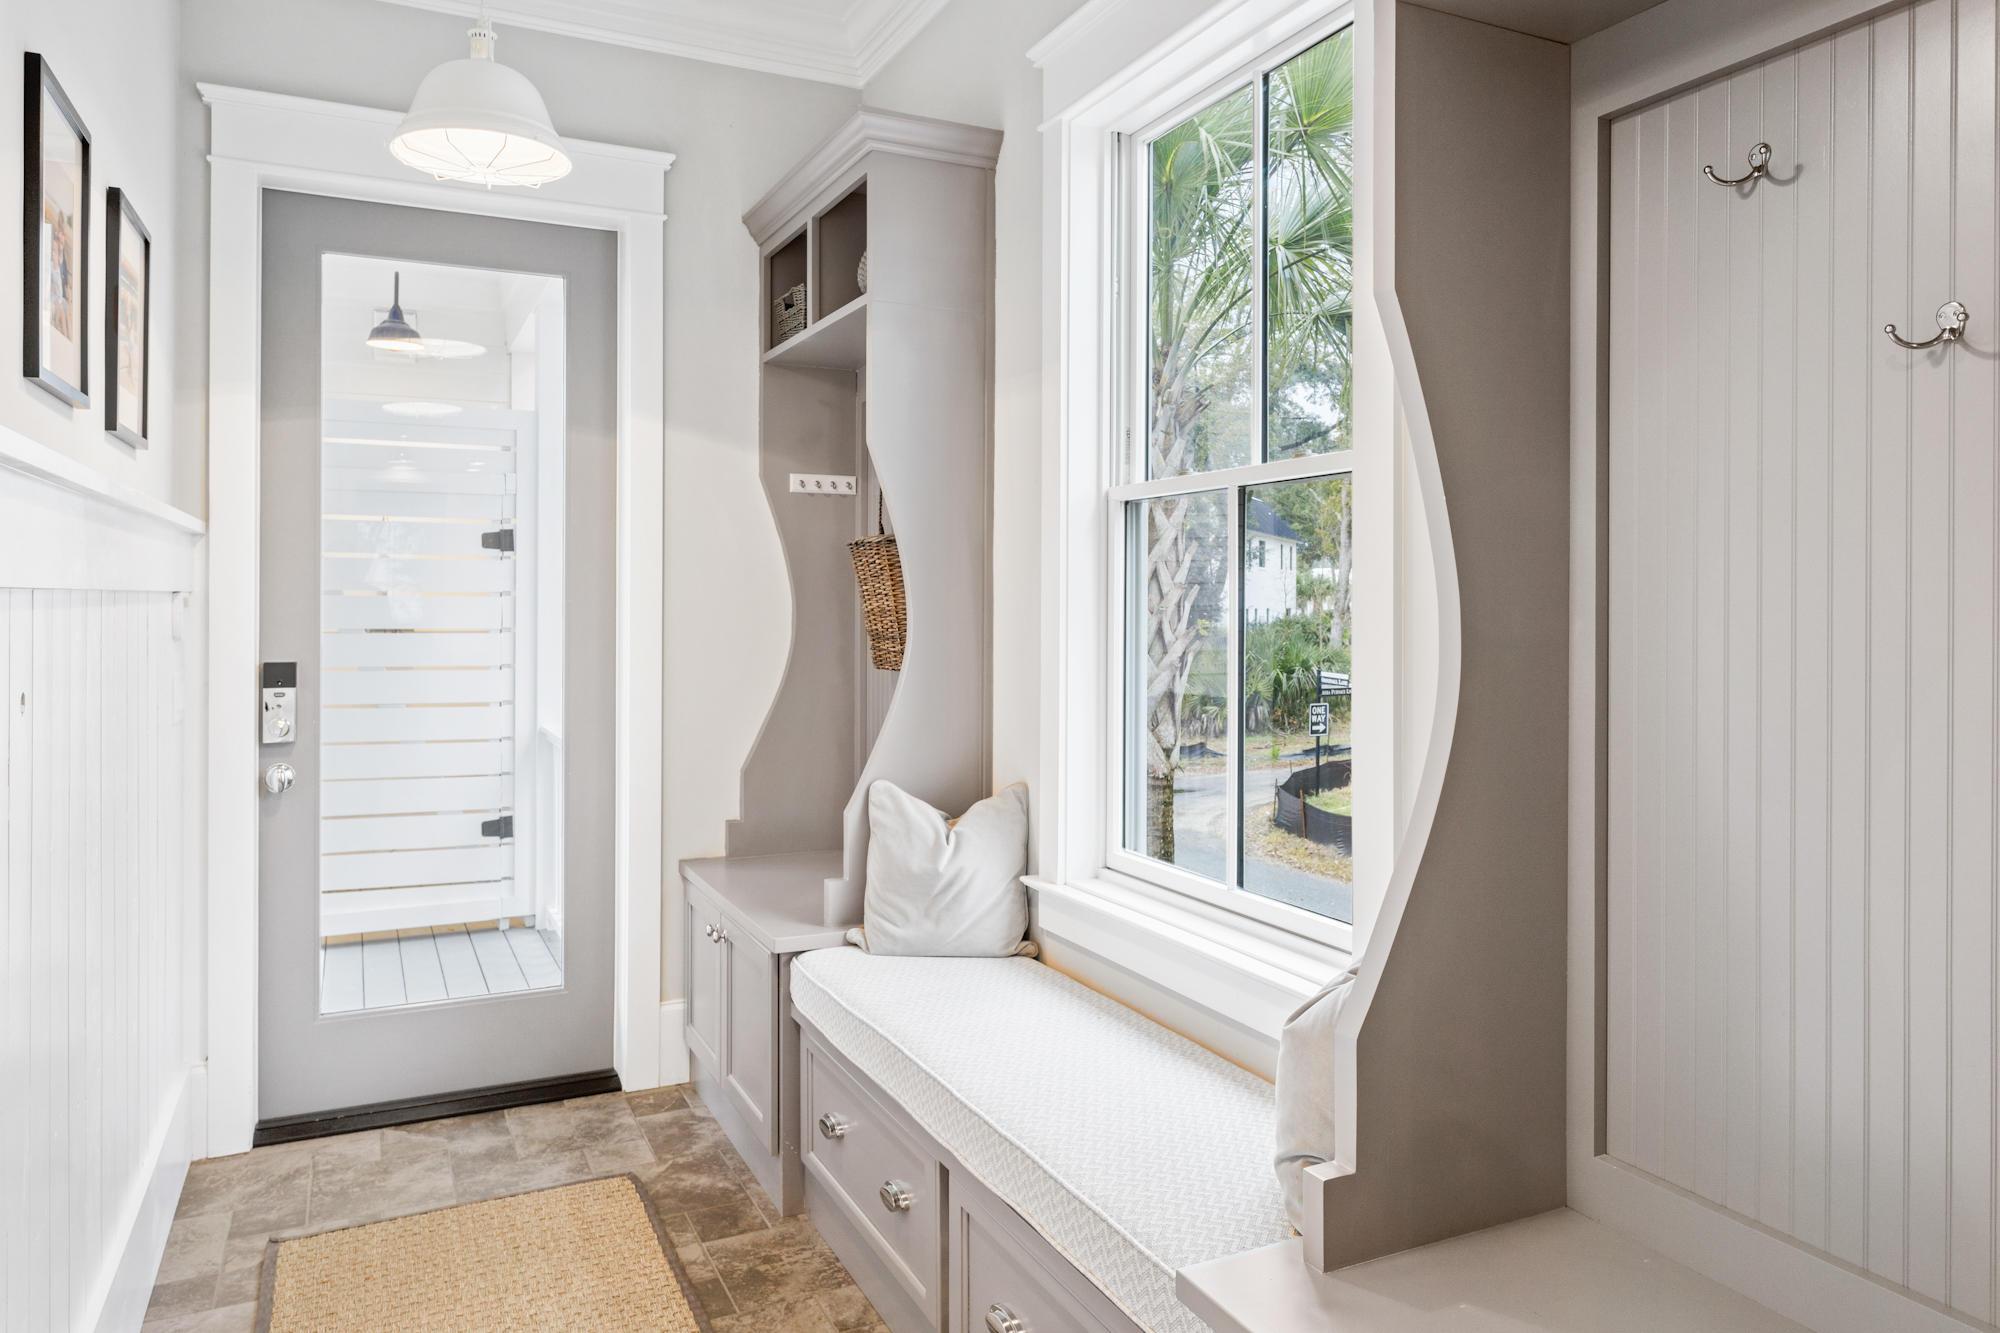 Daniel Island Park Homes For Sale - 458 Lesesne, Charleston, SC - 1